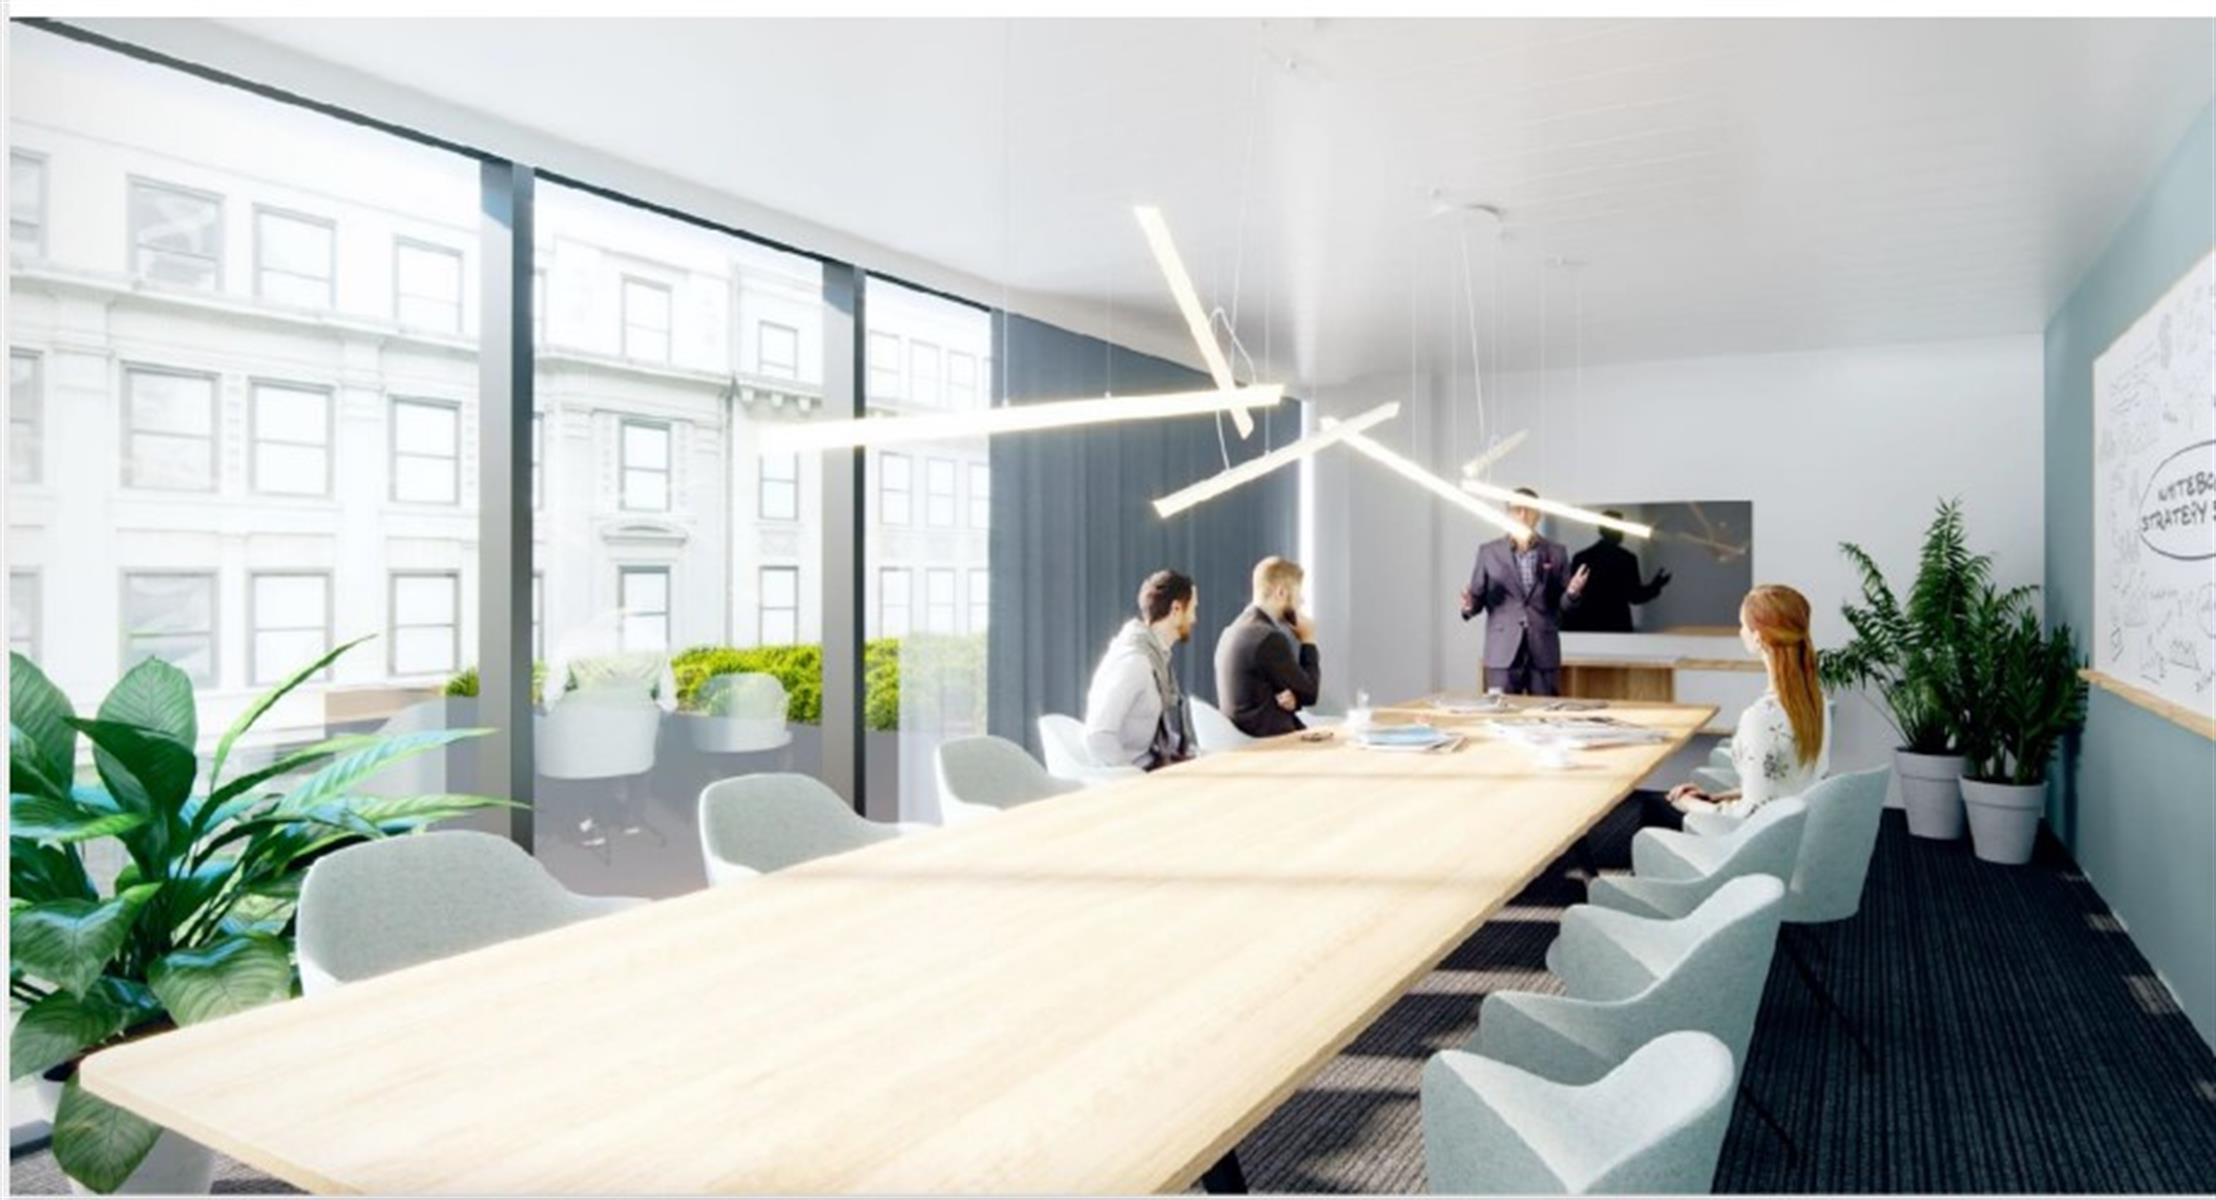 MANHATTAN CENTER OFFICES - Saint-Josse-ten-Noode - #4432642-3